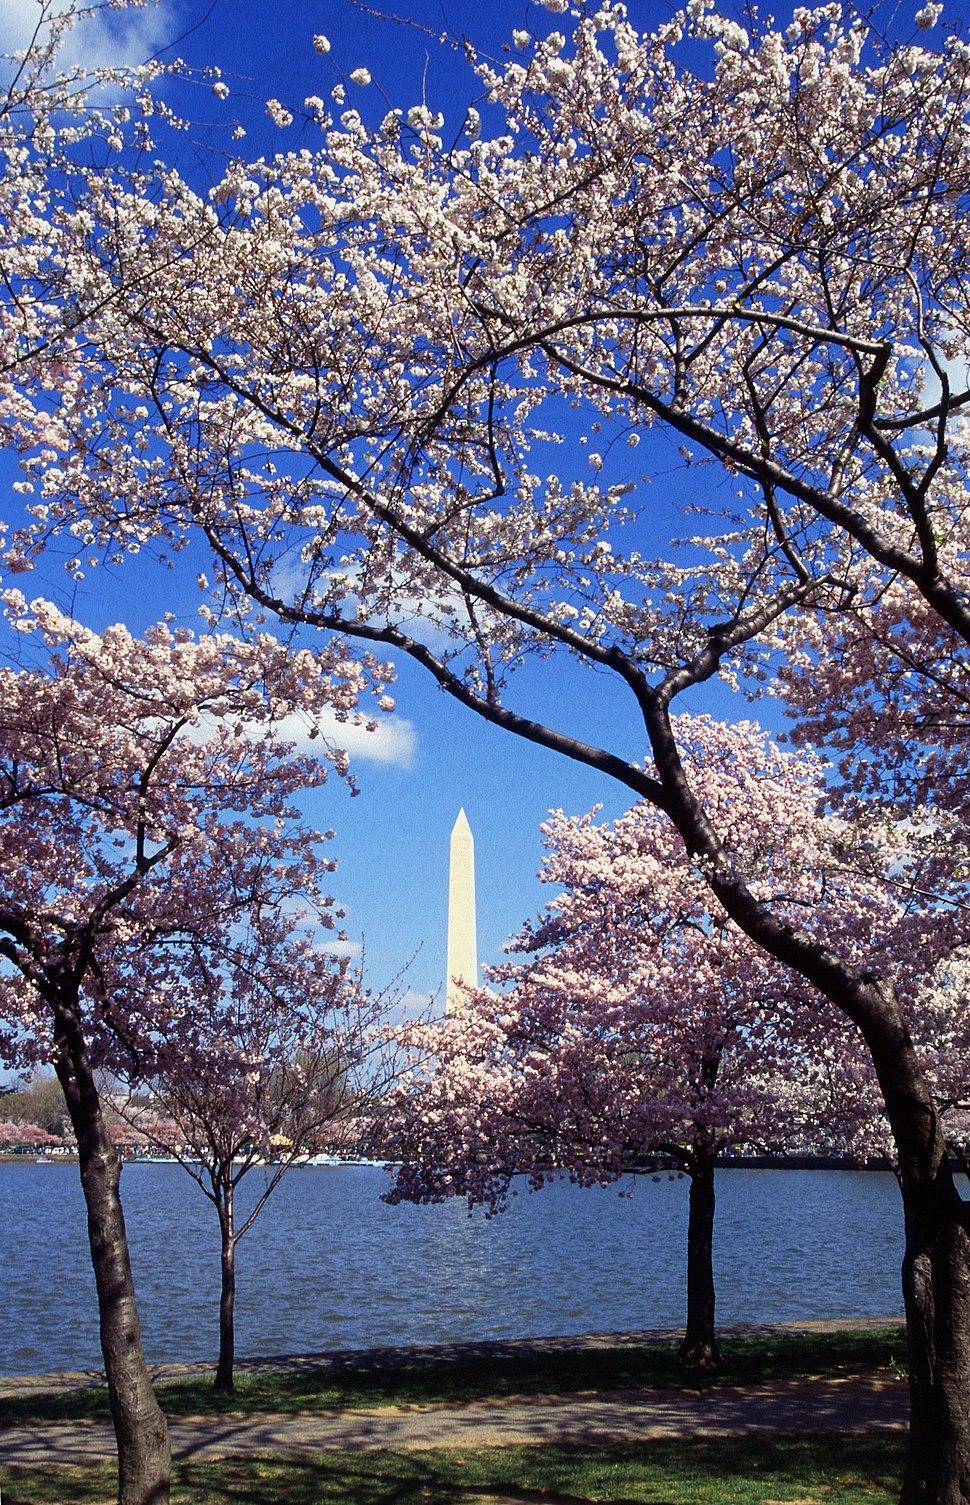 Washington C D.C. Tidal Basin cherry trees